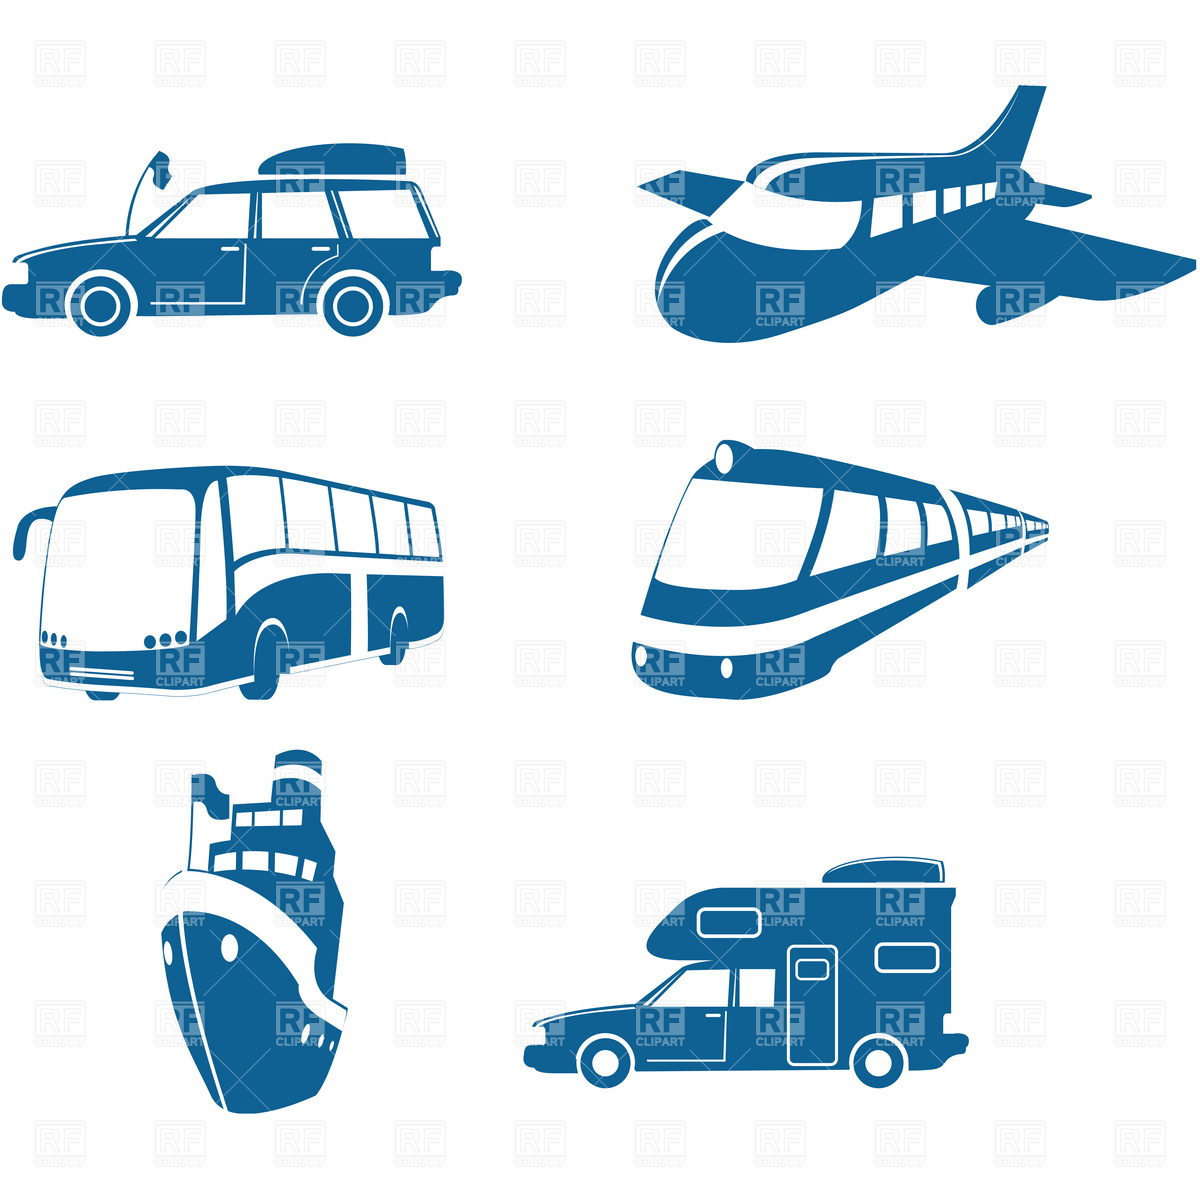 travel clipart free - photo #12